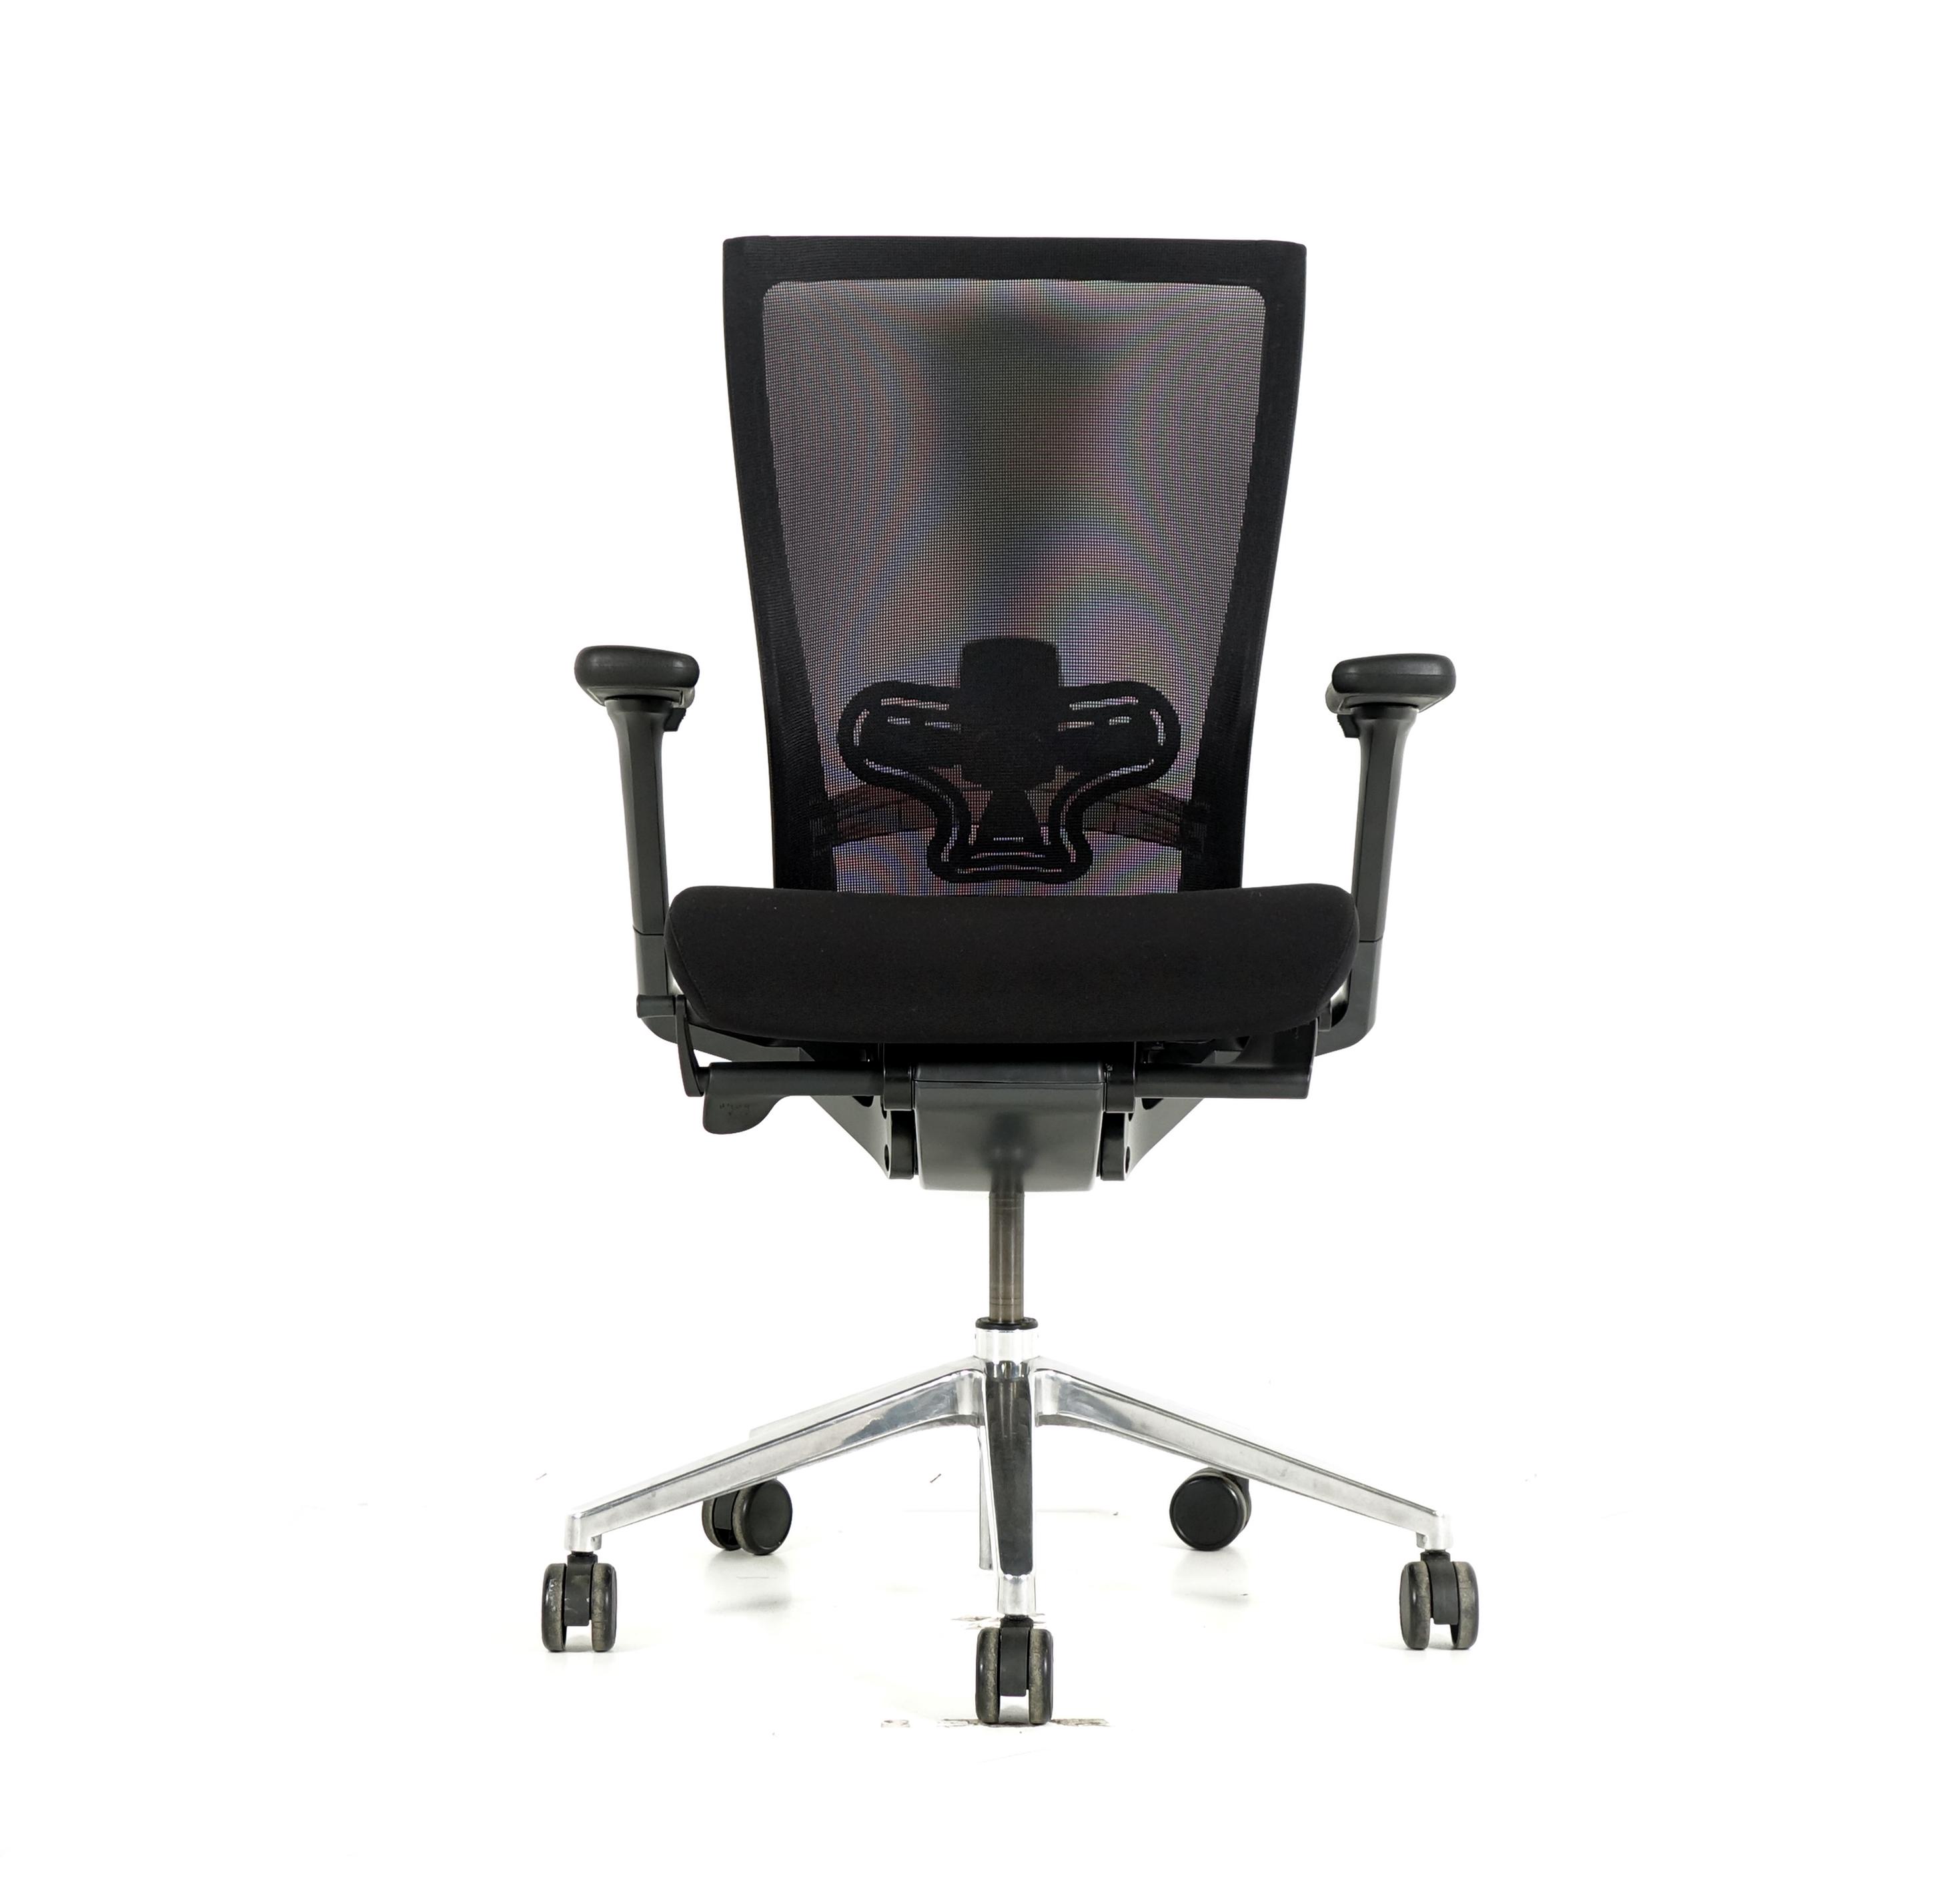 Sidiz T50 Mesh Chair